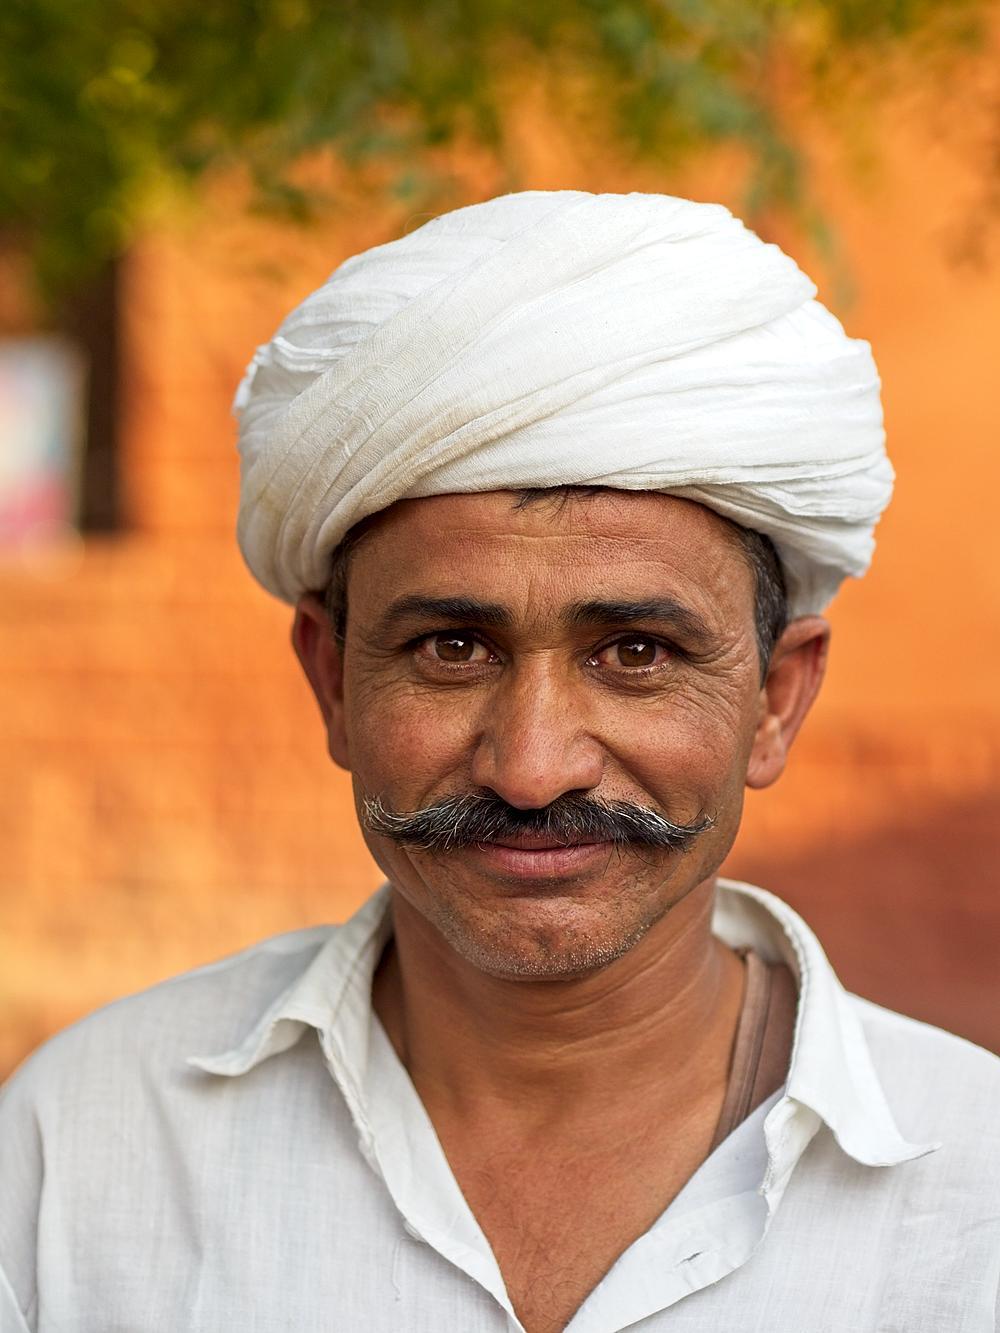 Mr Bishnoi, Rajasthan, India, by Sam Davis Photographer Professional Travel White turban